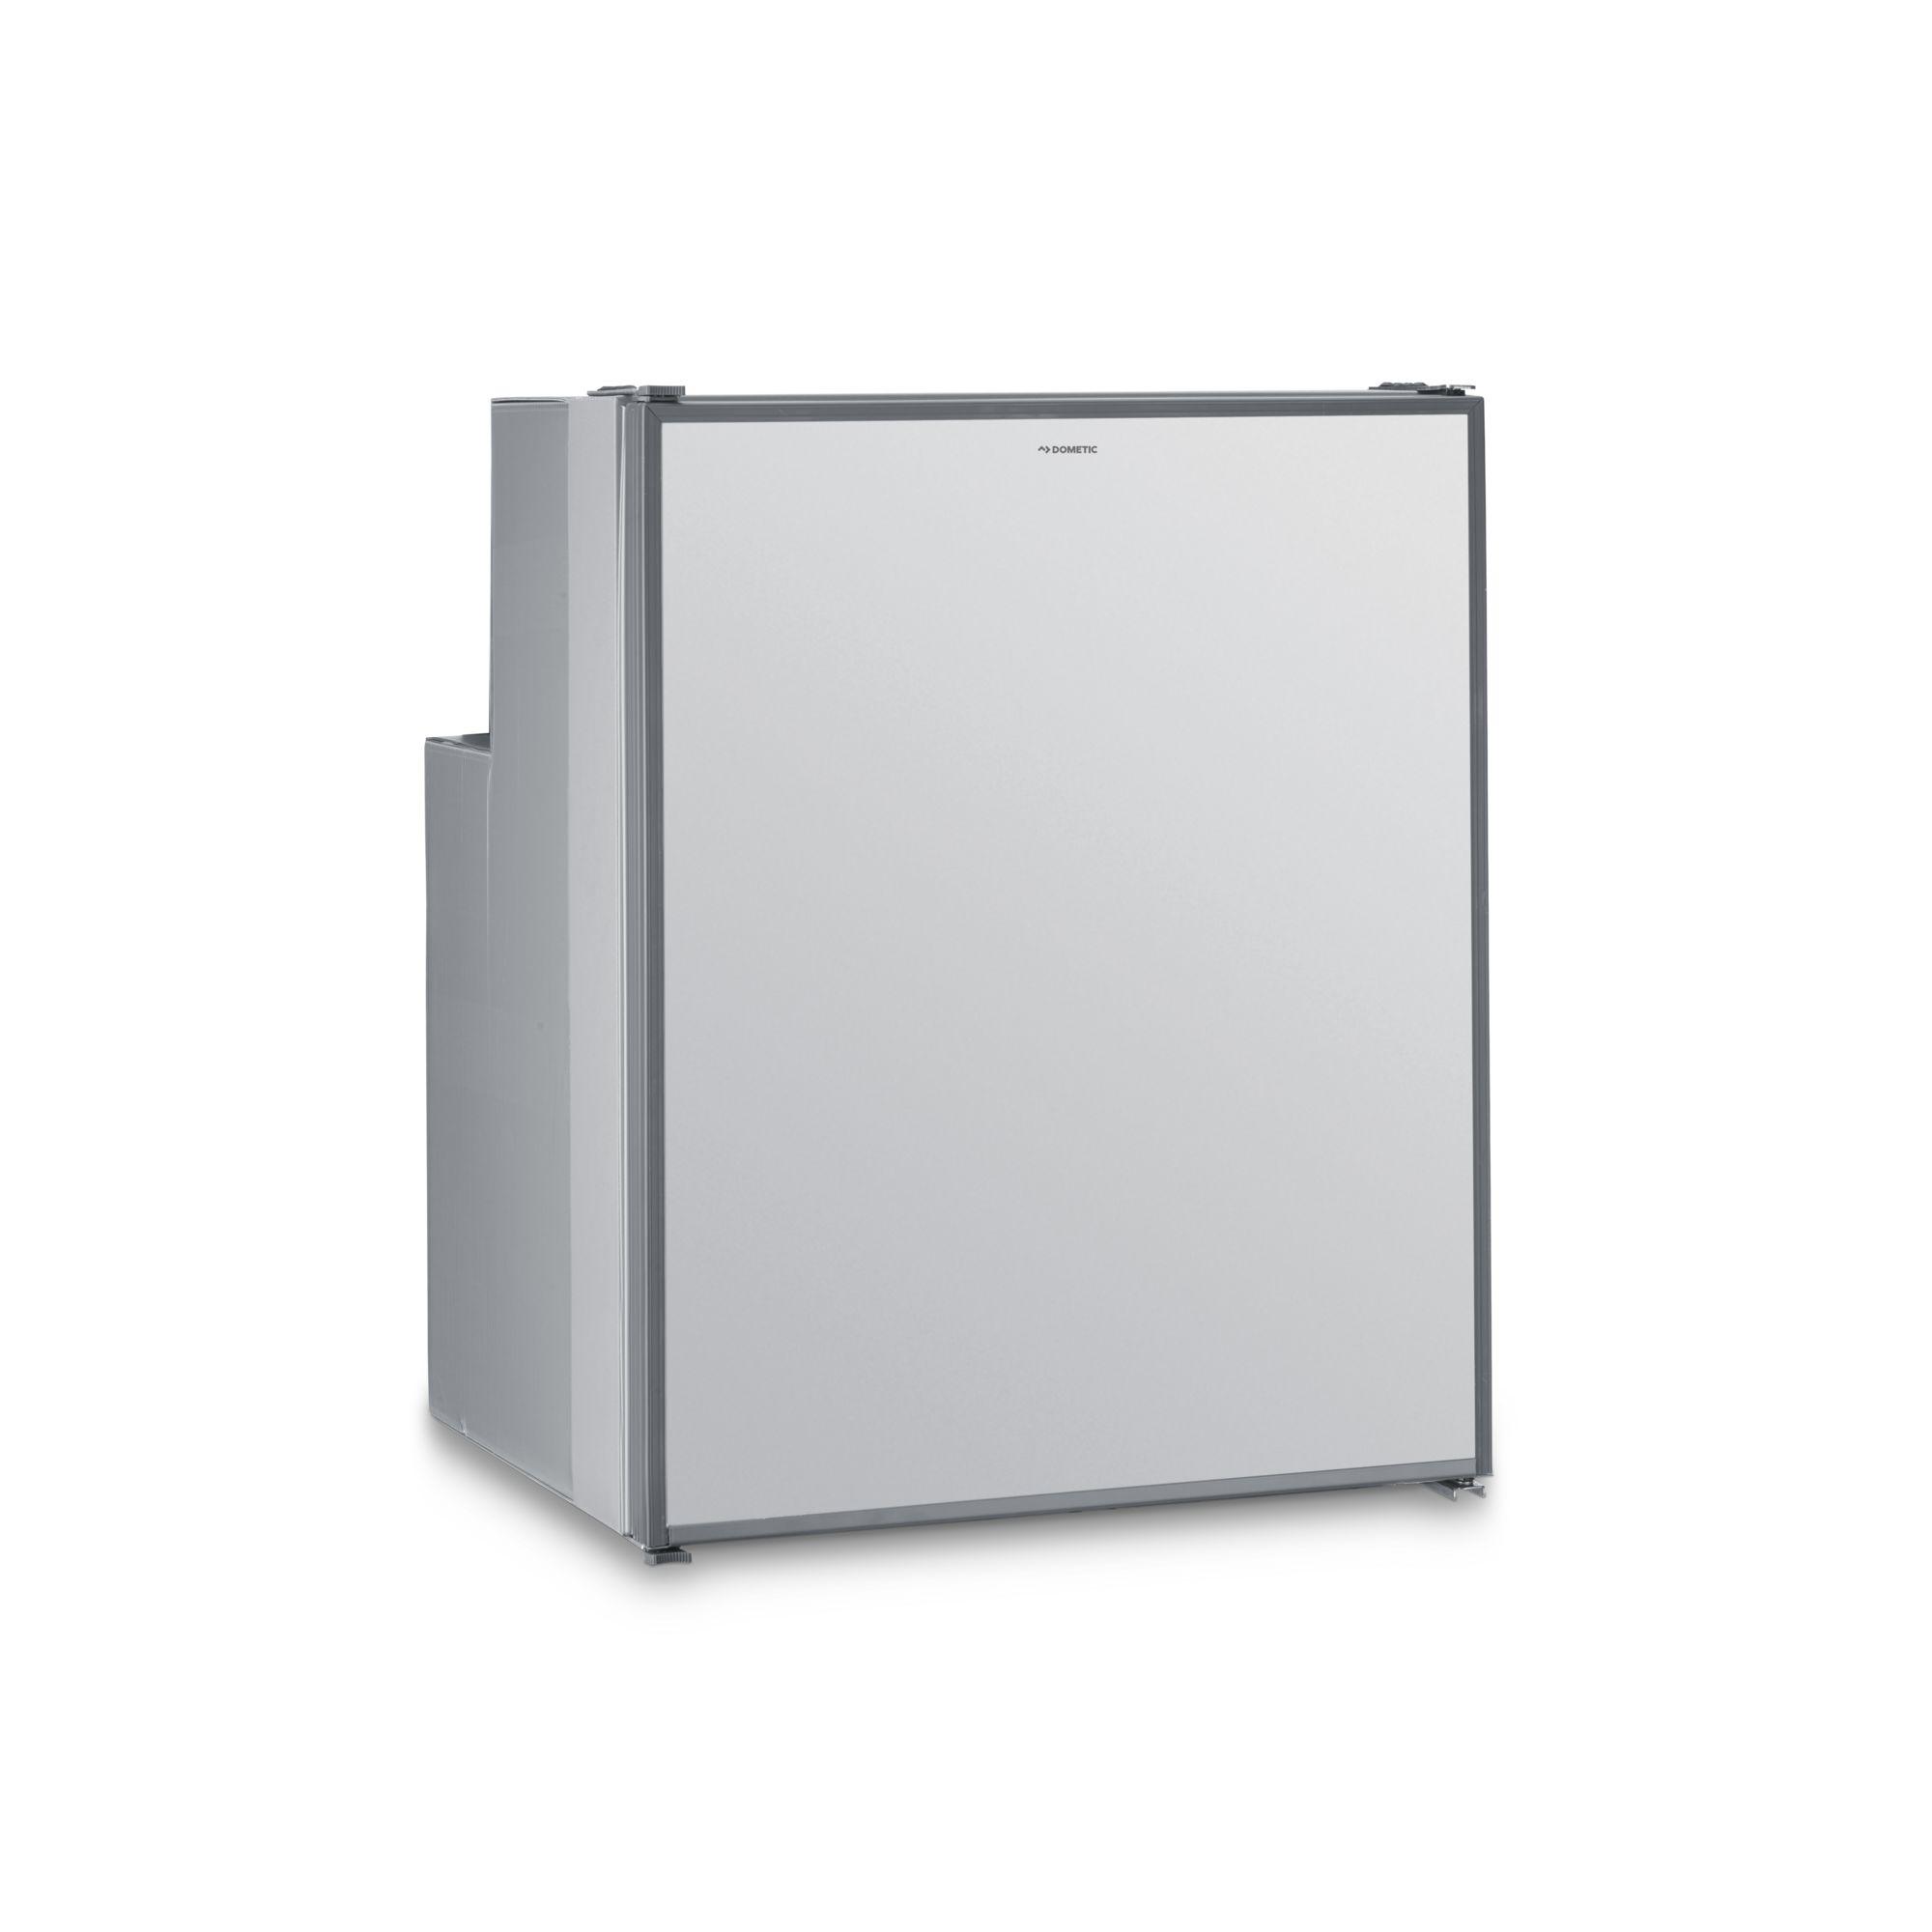 mobilecamper.ch - DOMETIC Coolmatic MDC 65 Kompressor-Kühlschrank